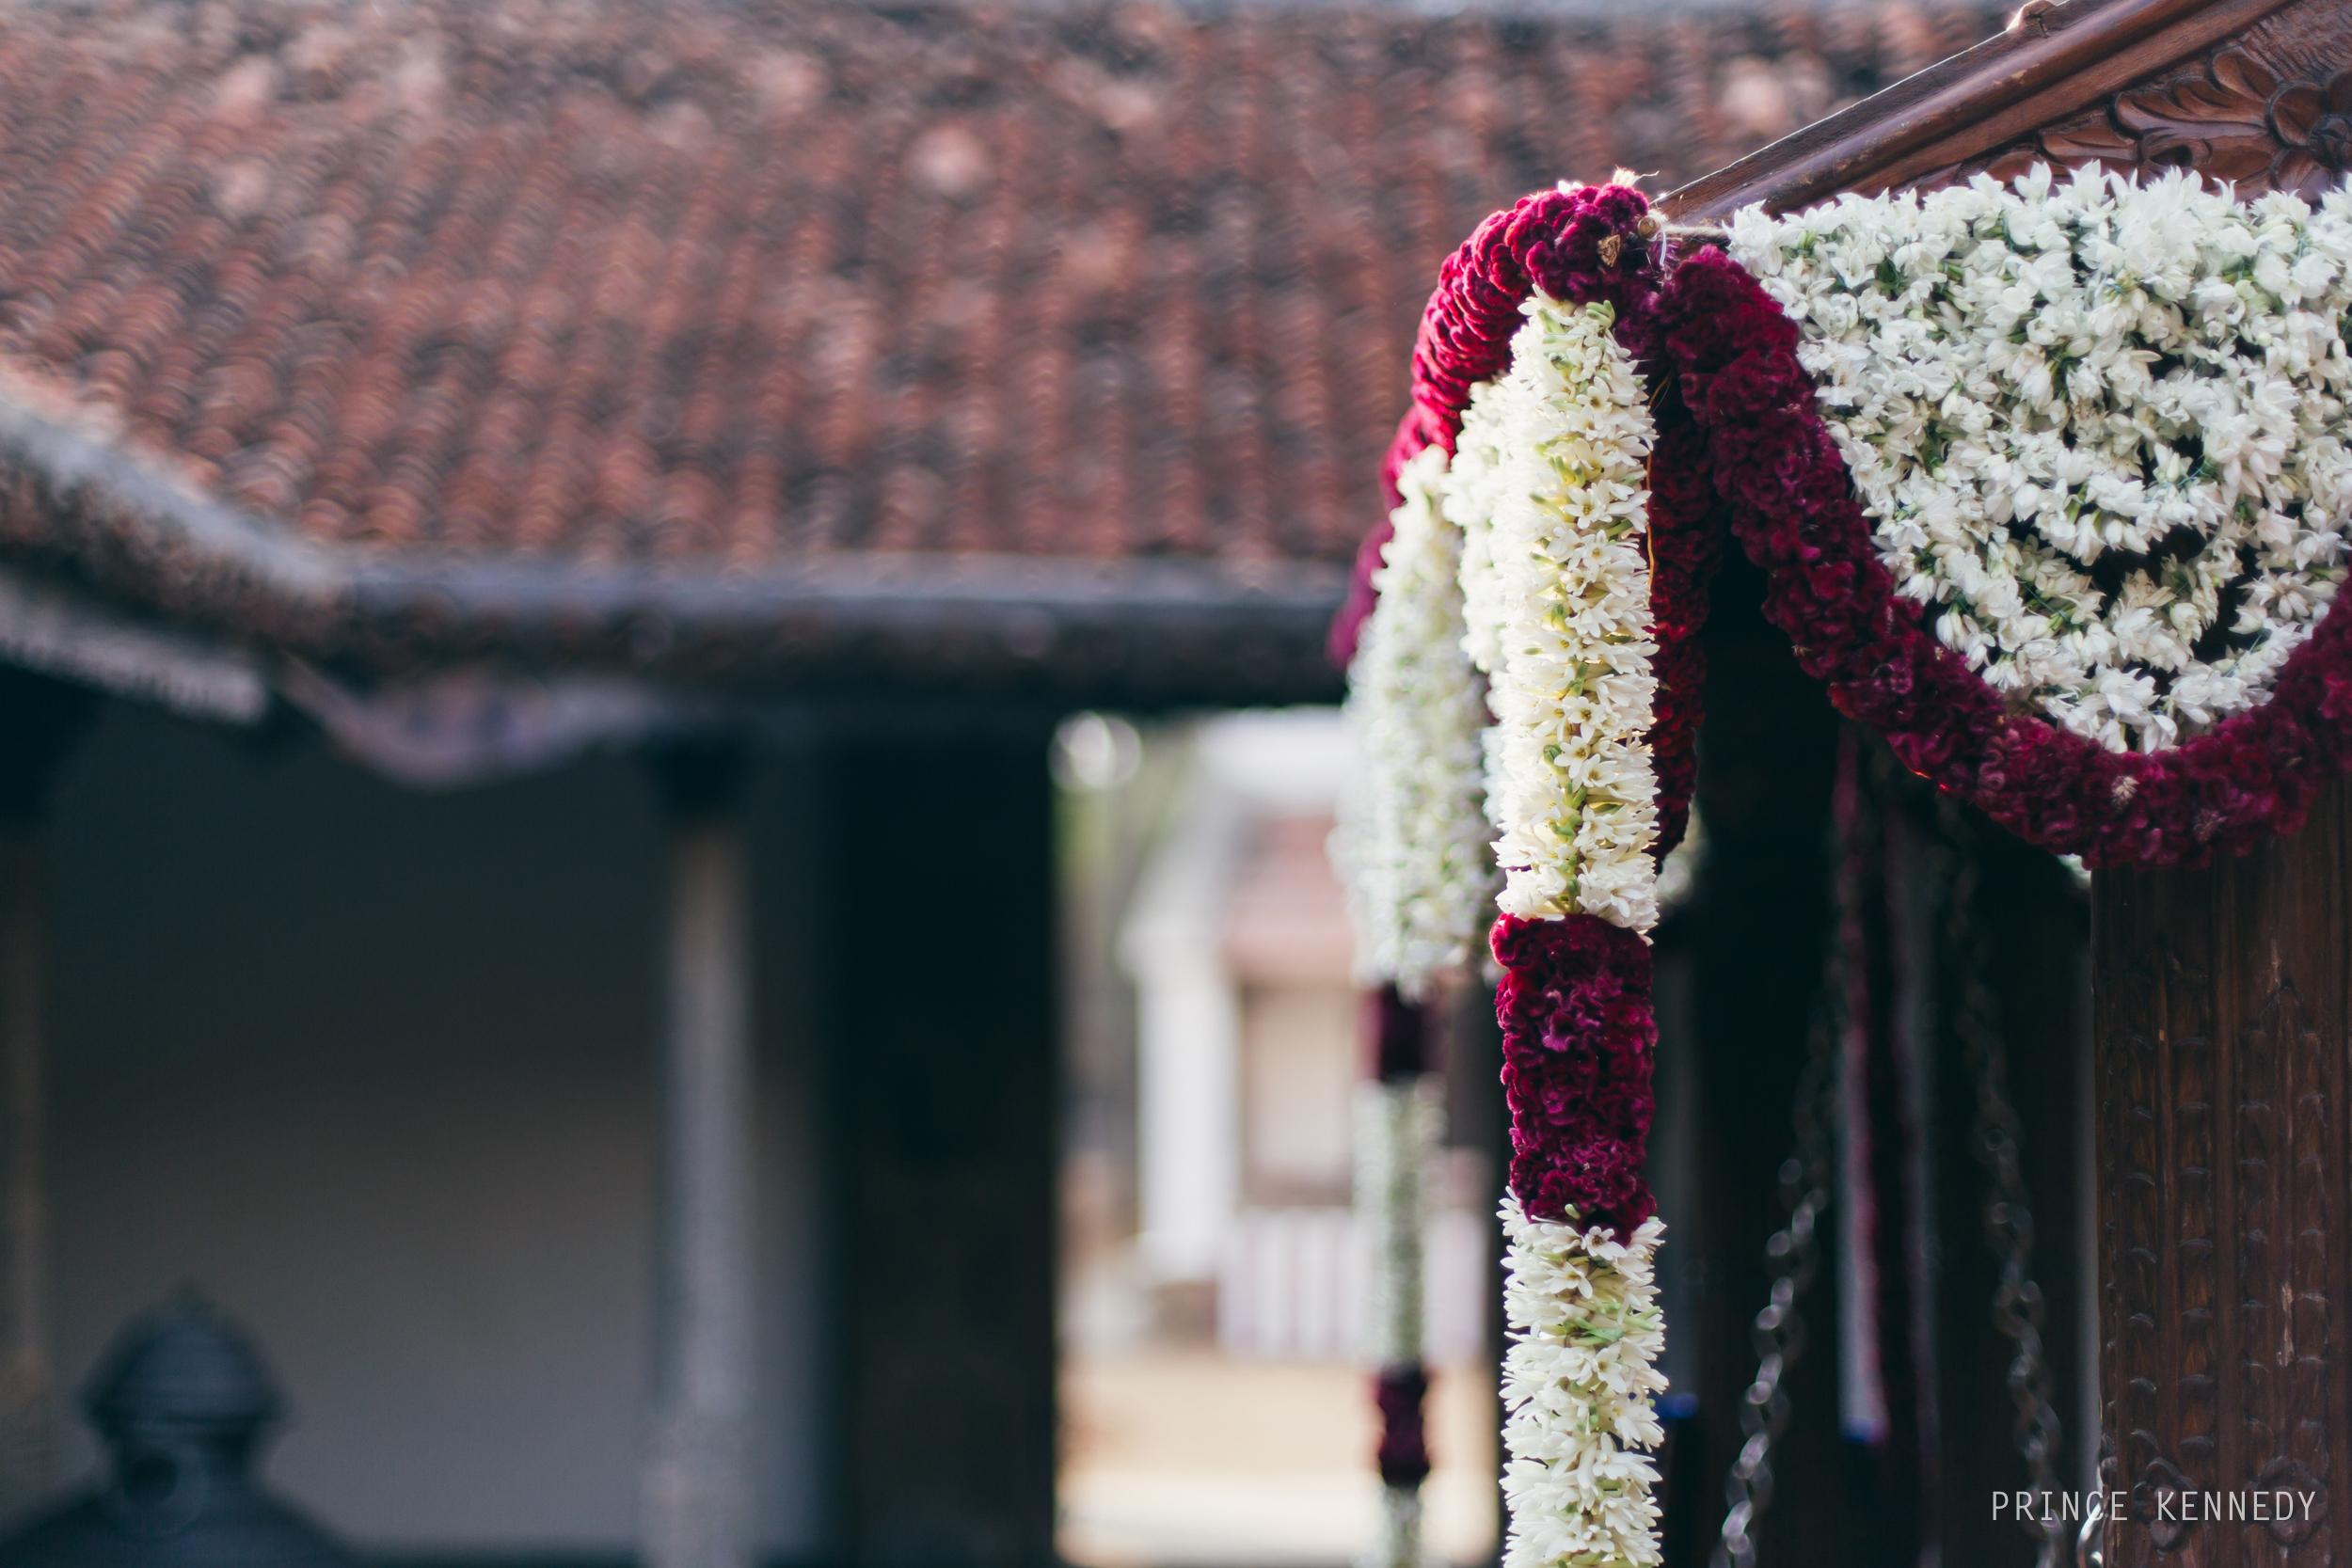 Athmajja-Nithesh-Engagement-Couple-Portrait-Portraiture-Wedding-Couple-Portrait-Chennai-Photographer-Candid-Photography-Destination-Best-Prince-Kennedy-Photography-19.jpg